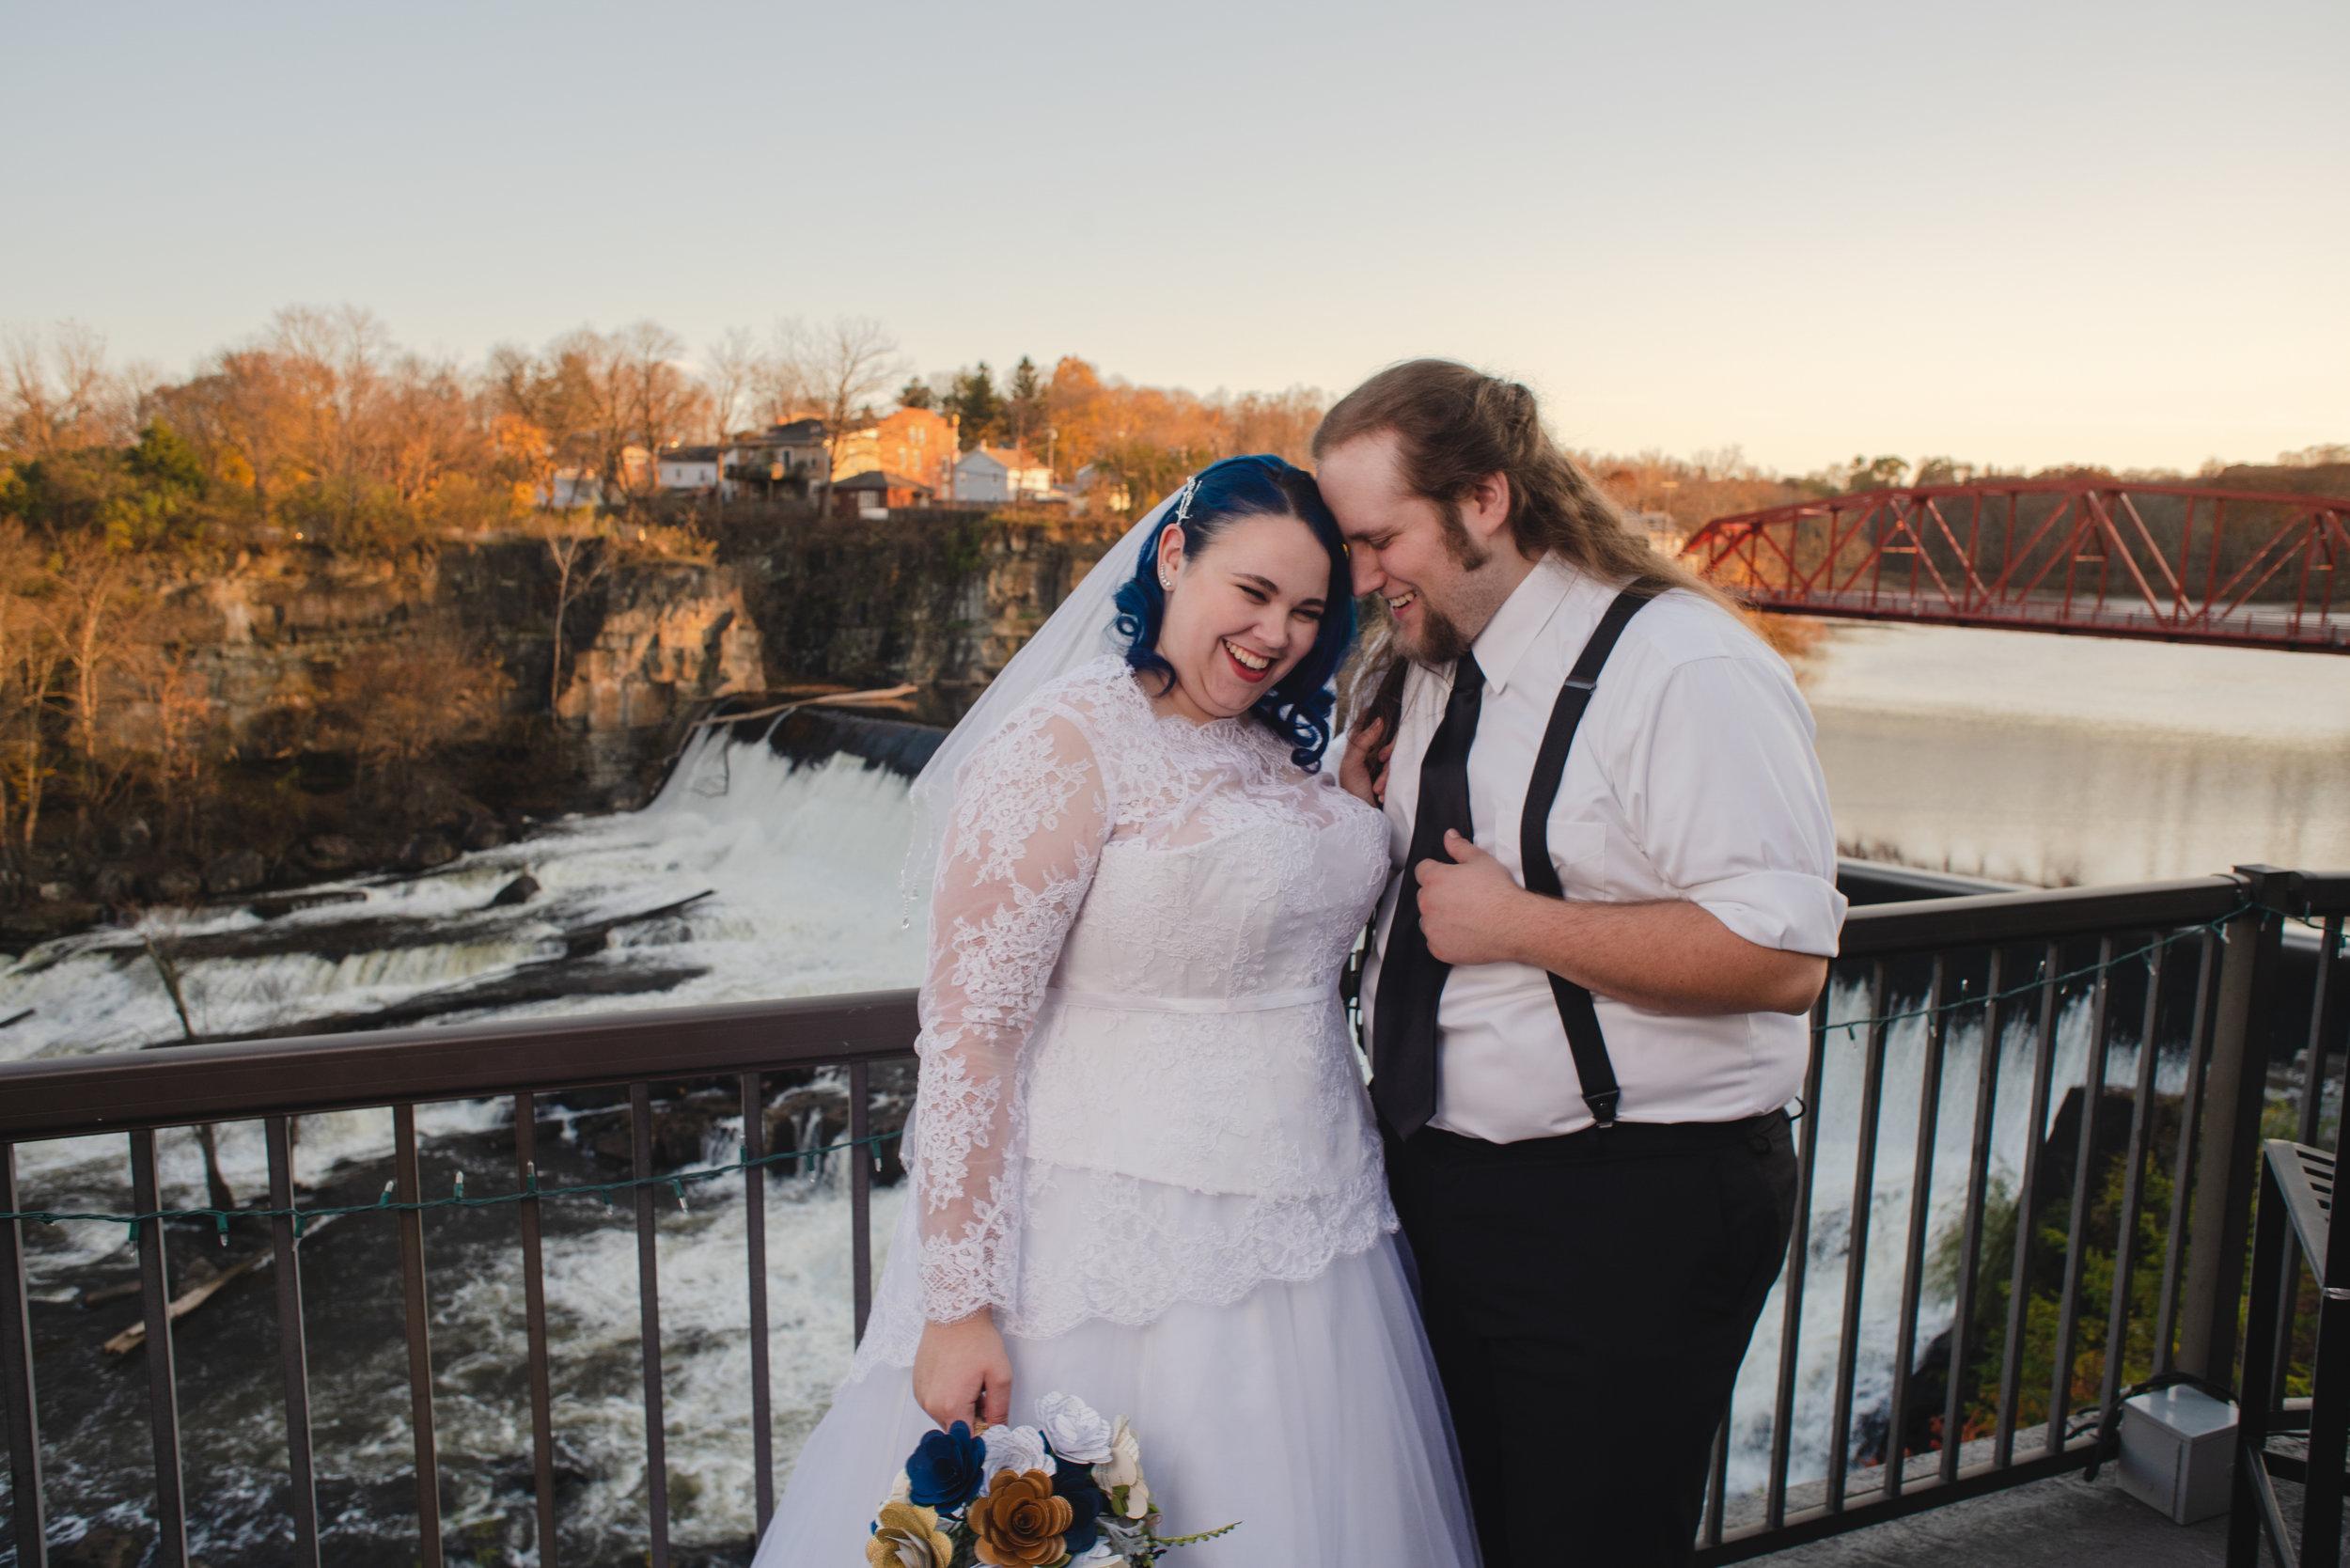 DSC00061.ARWRobin&matt_wedding_Danny11-11-20187513.jpg